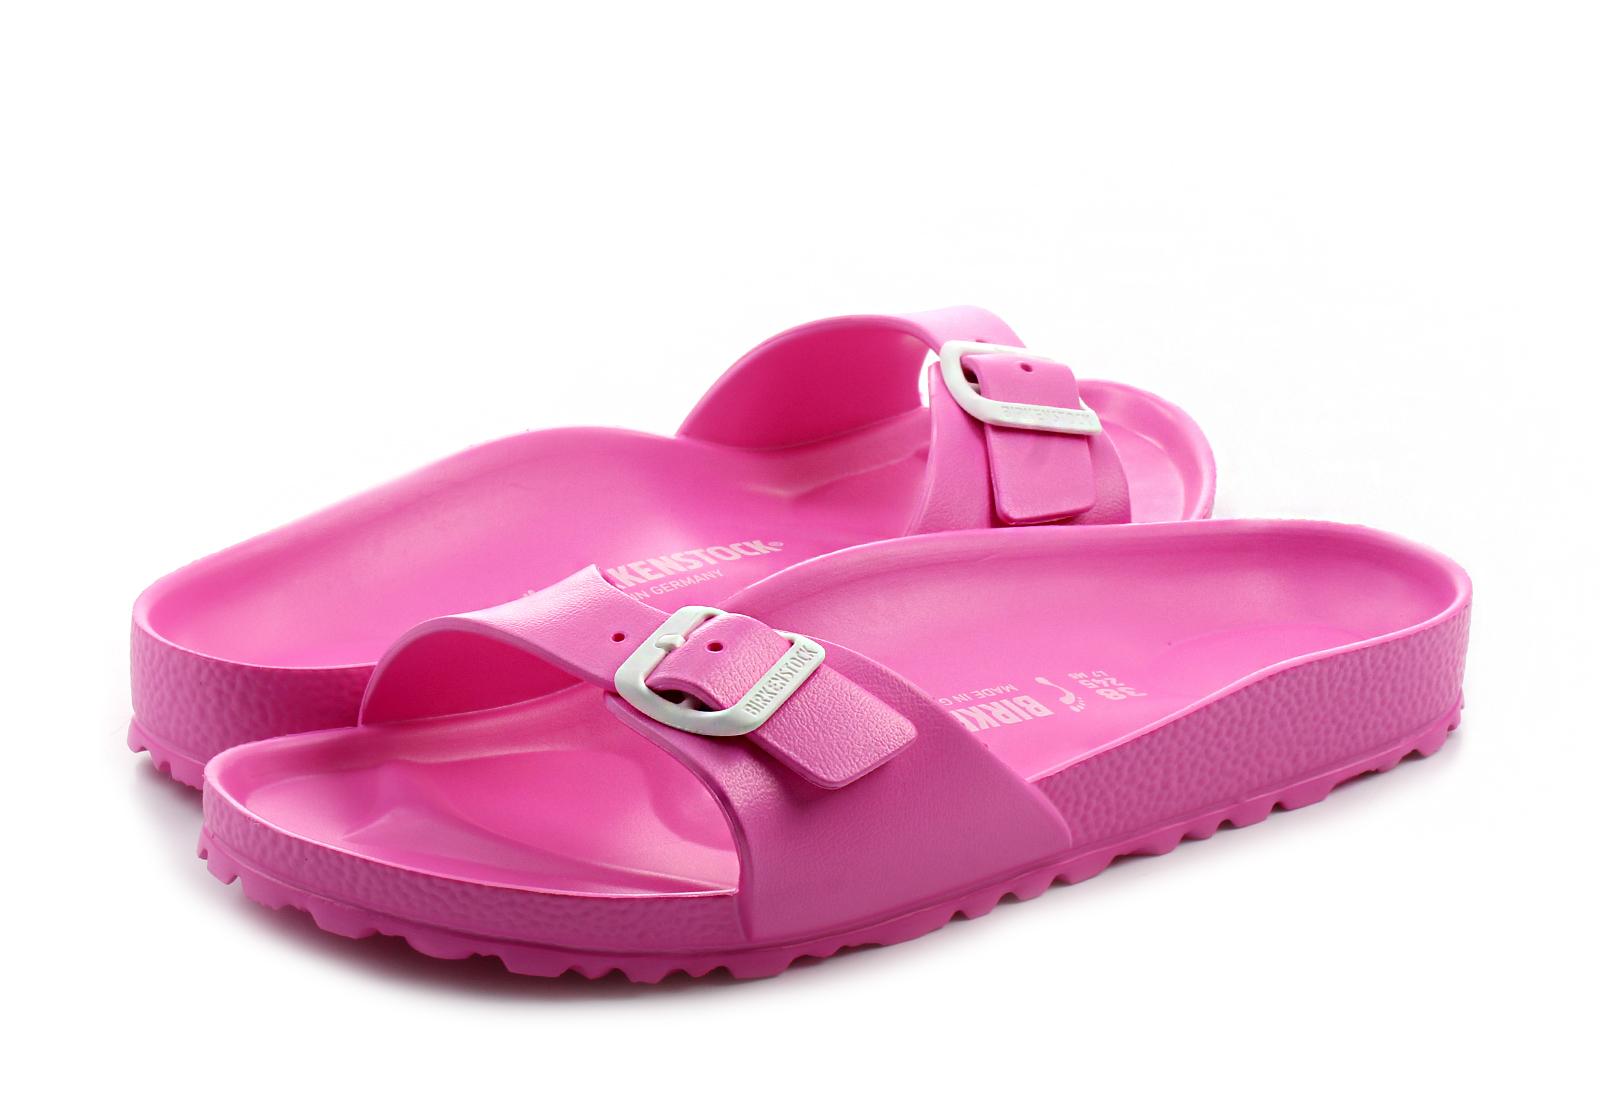 birkenstock slippers madrid eva 128303 pnk online shop for sneakers shoes and boots. Black Bedroom Furniture Sets. Home Design Ideas